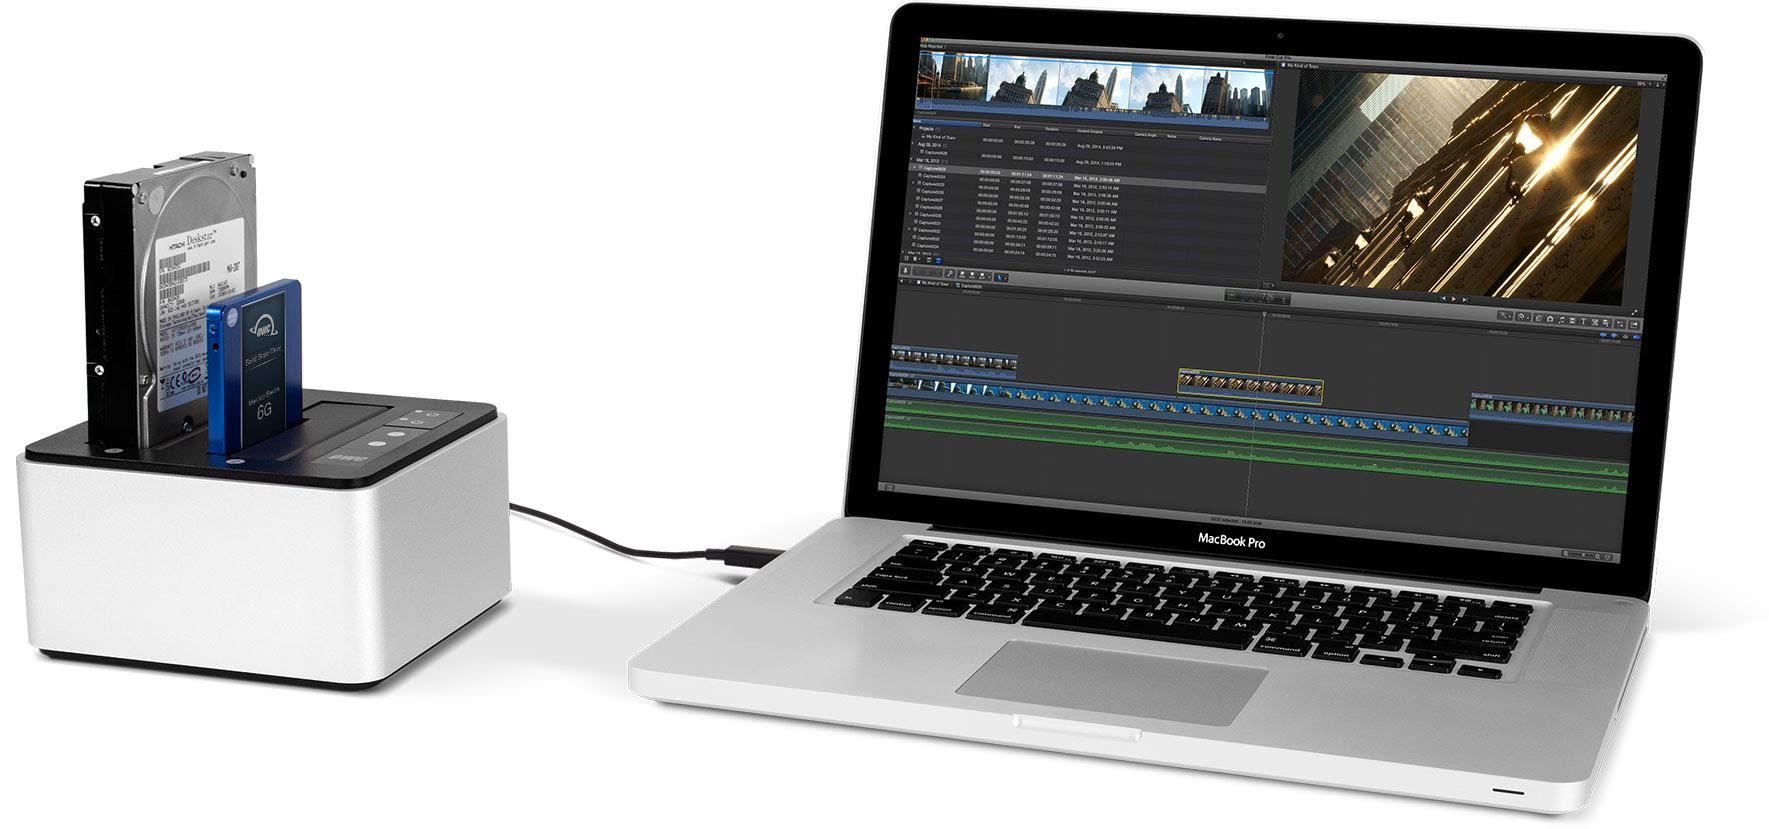 OWC announces USB Type-C Drive Dock docking station